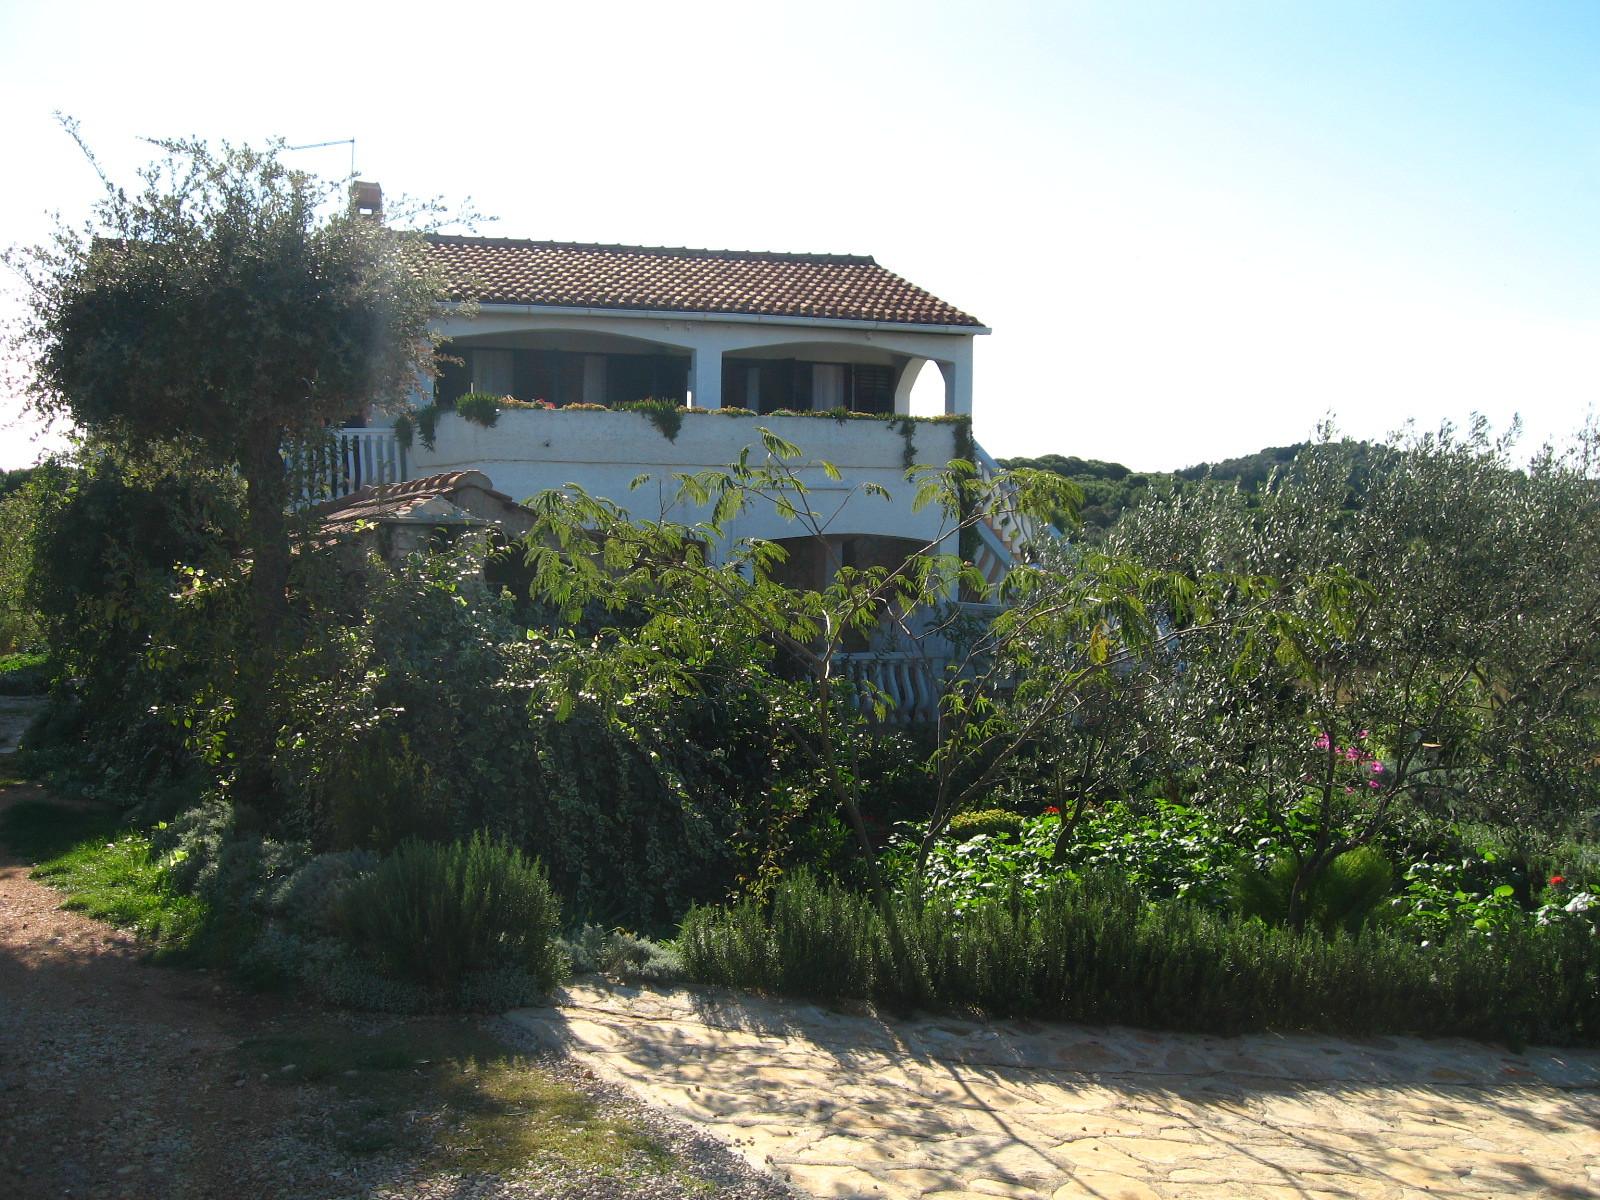 Ferienwohnung Lado SA1(2+1) - Muline (741846), Ugljan, Insel Ugljan, Dalmatien, Kroatien, Bild 3